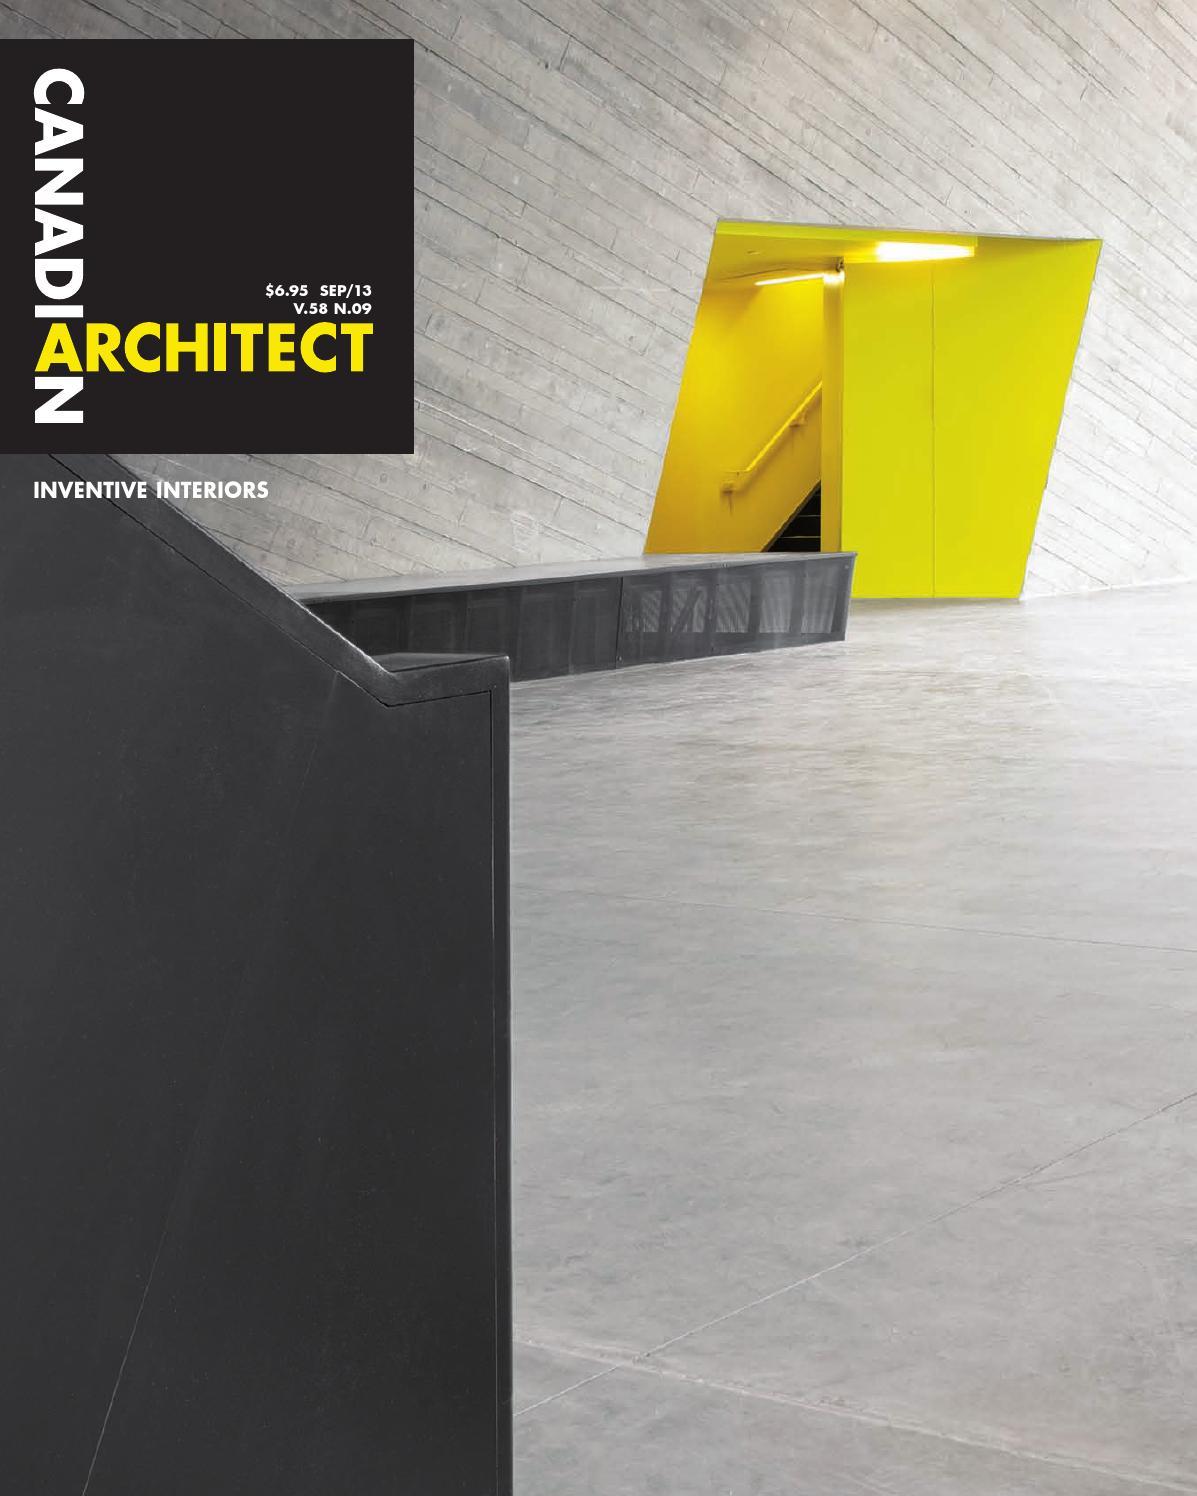 canadian architect september 2013 by iq business media issuu rh issuu com